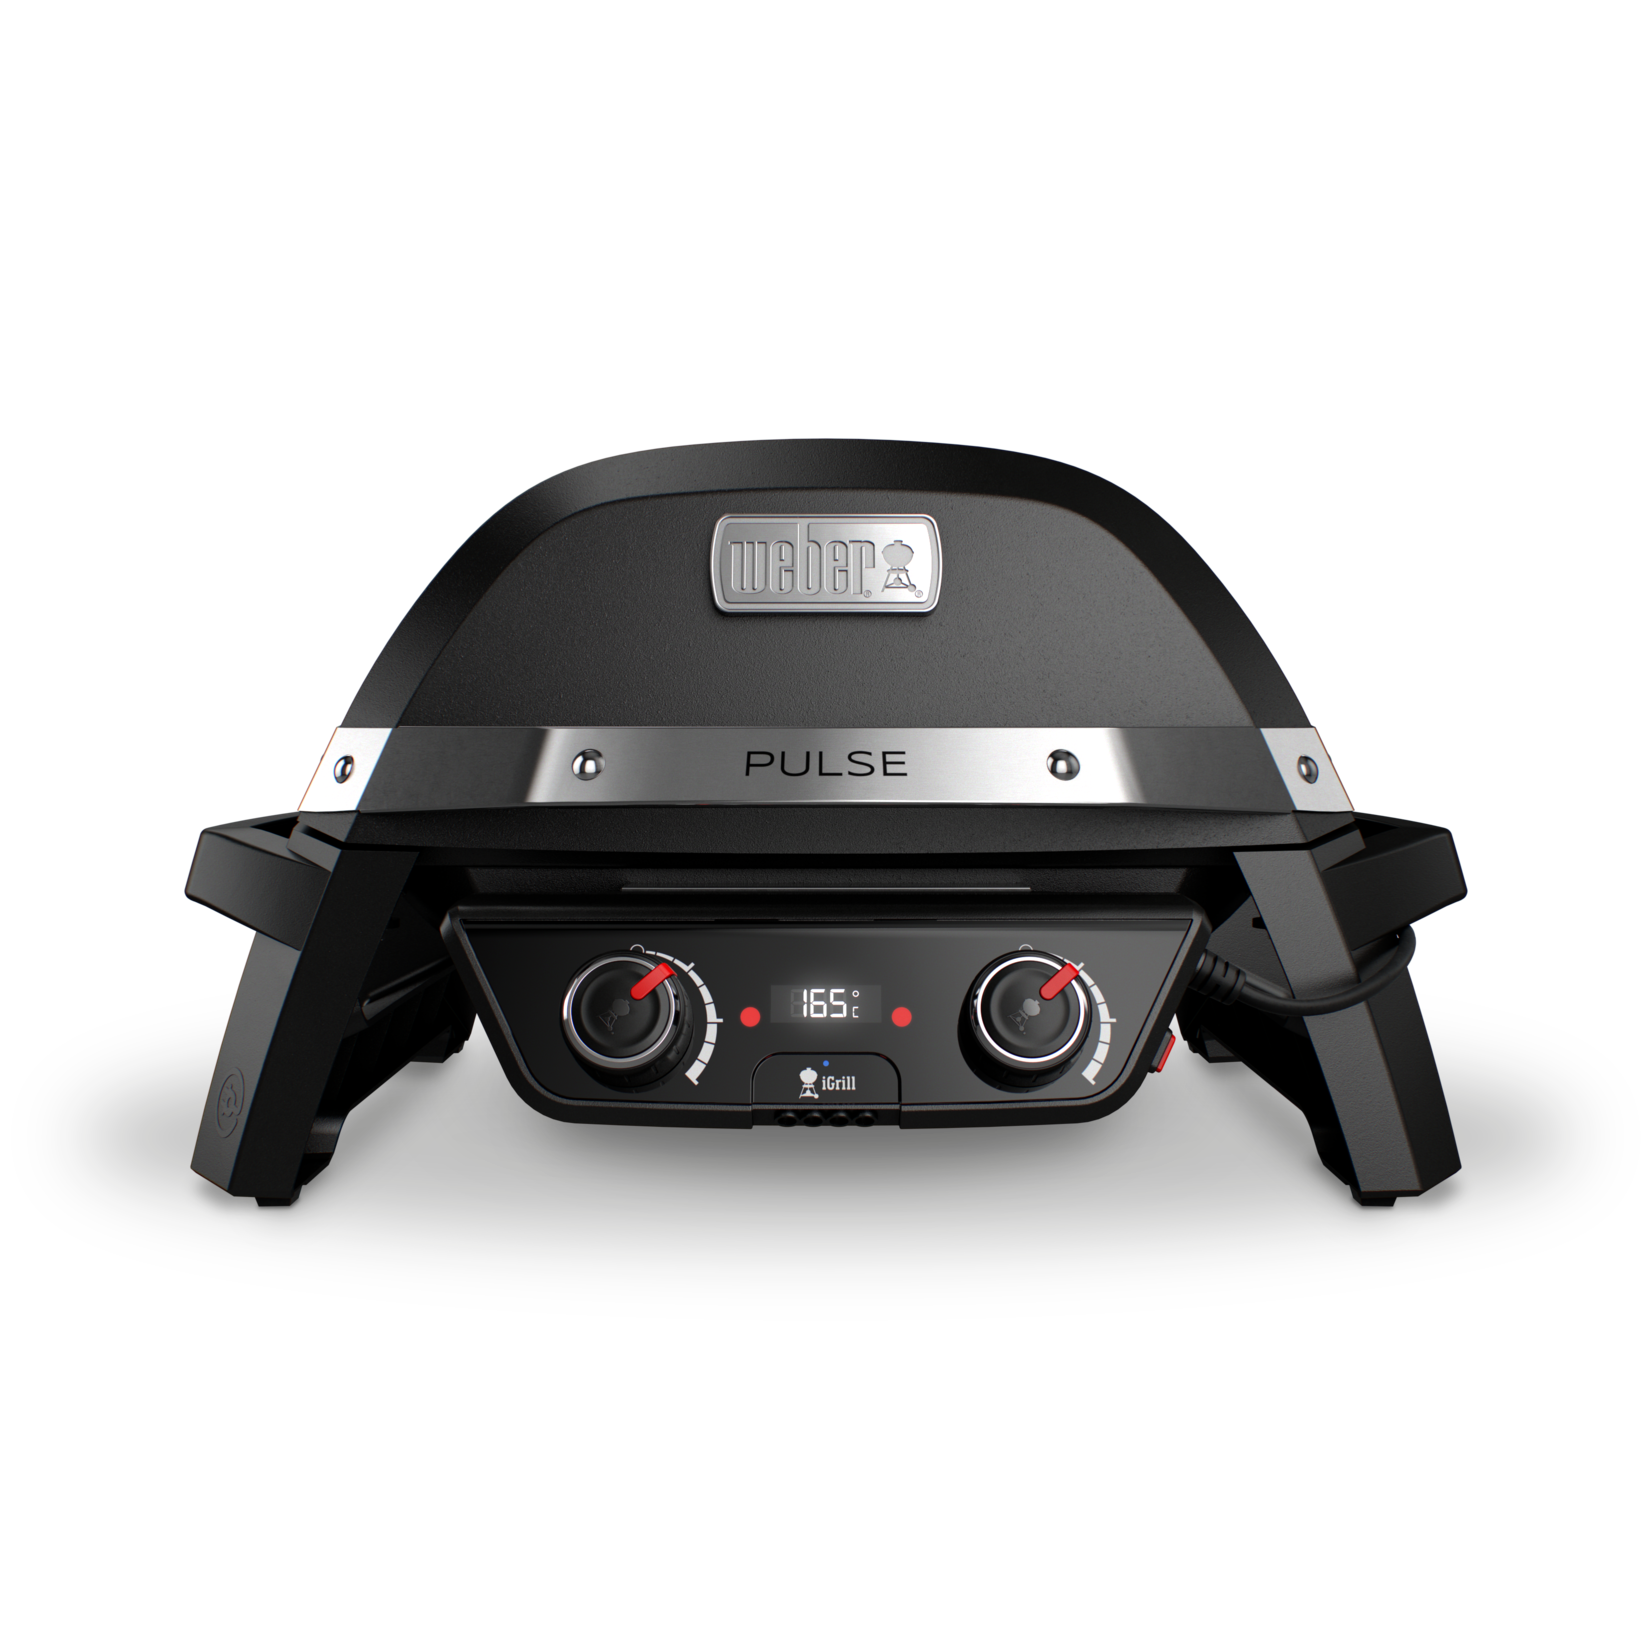 Weber Weber Pulse 2000 elektrische barbecue